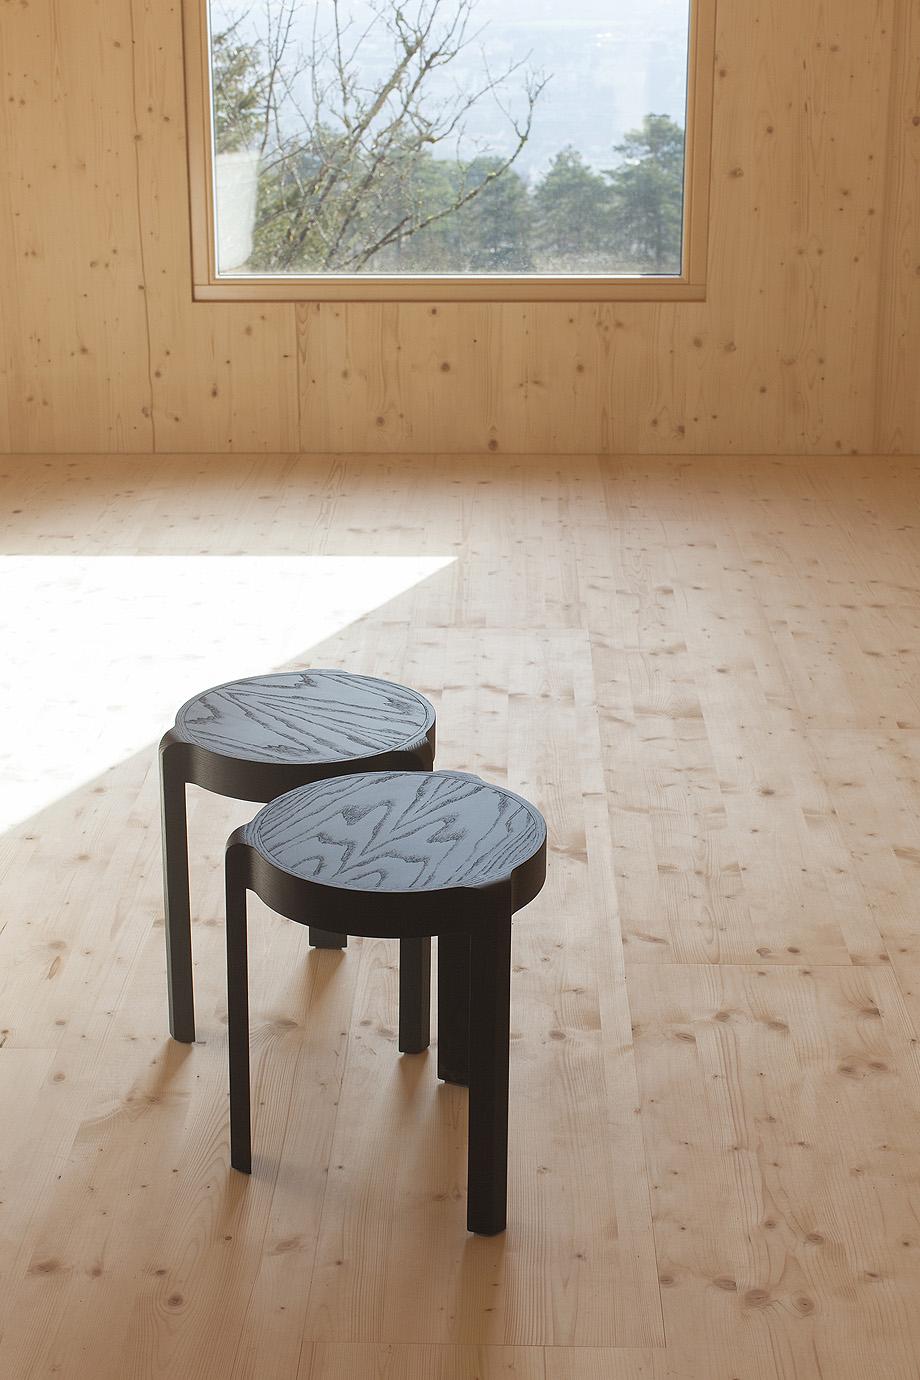 casa pasiva de atelier ordinaire - foto julien renault (3)